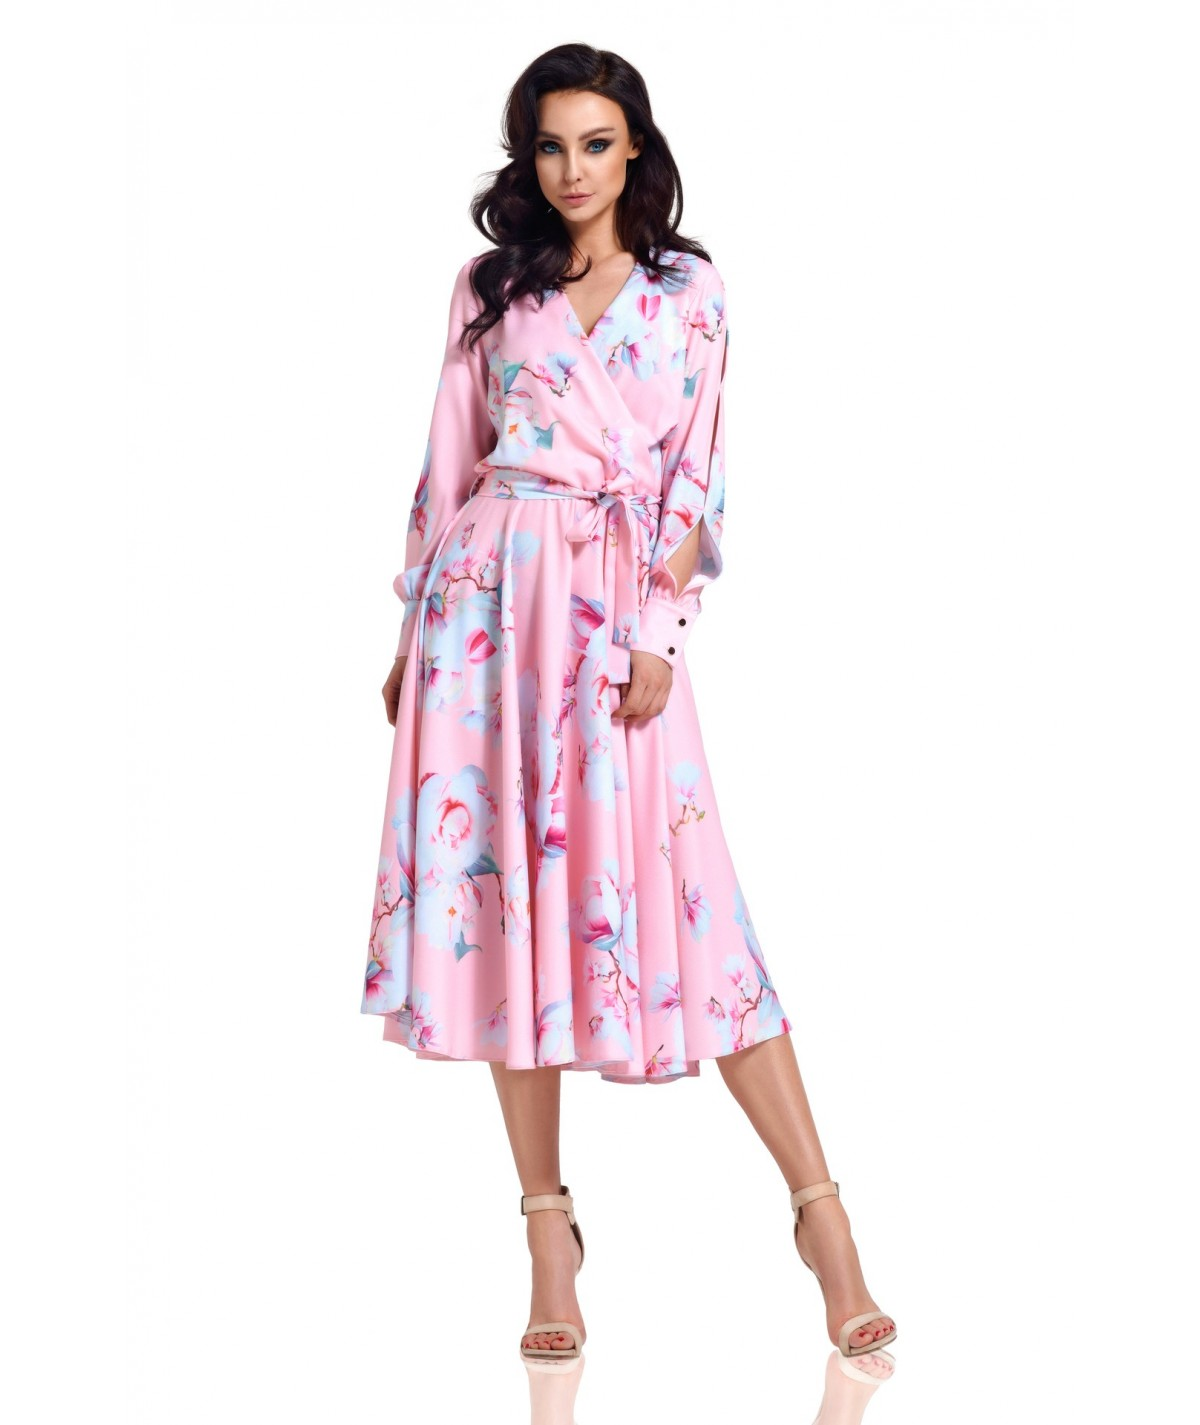 Rozkloszowan sukienka Midi - Lemoniade L302